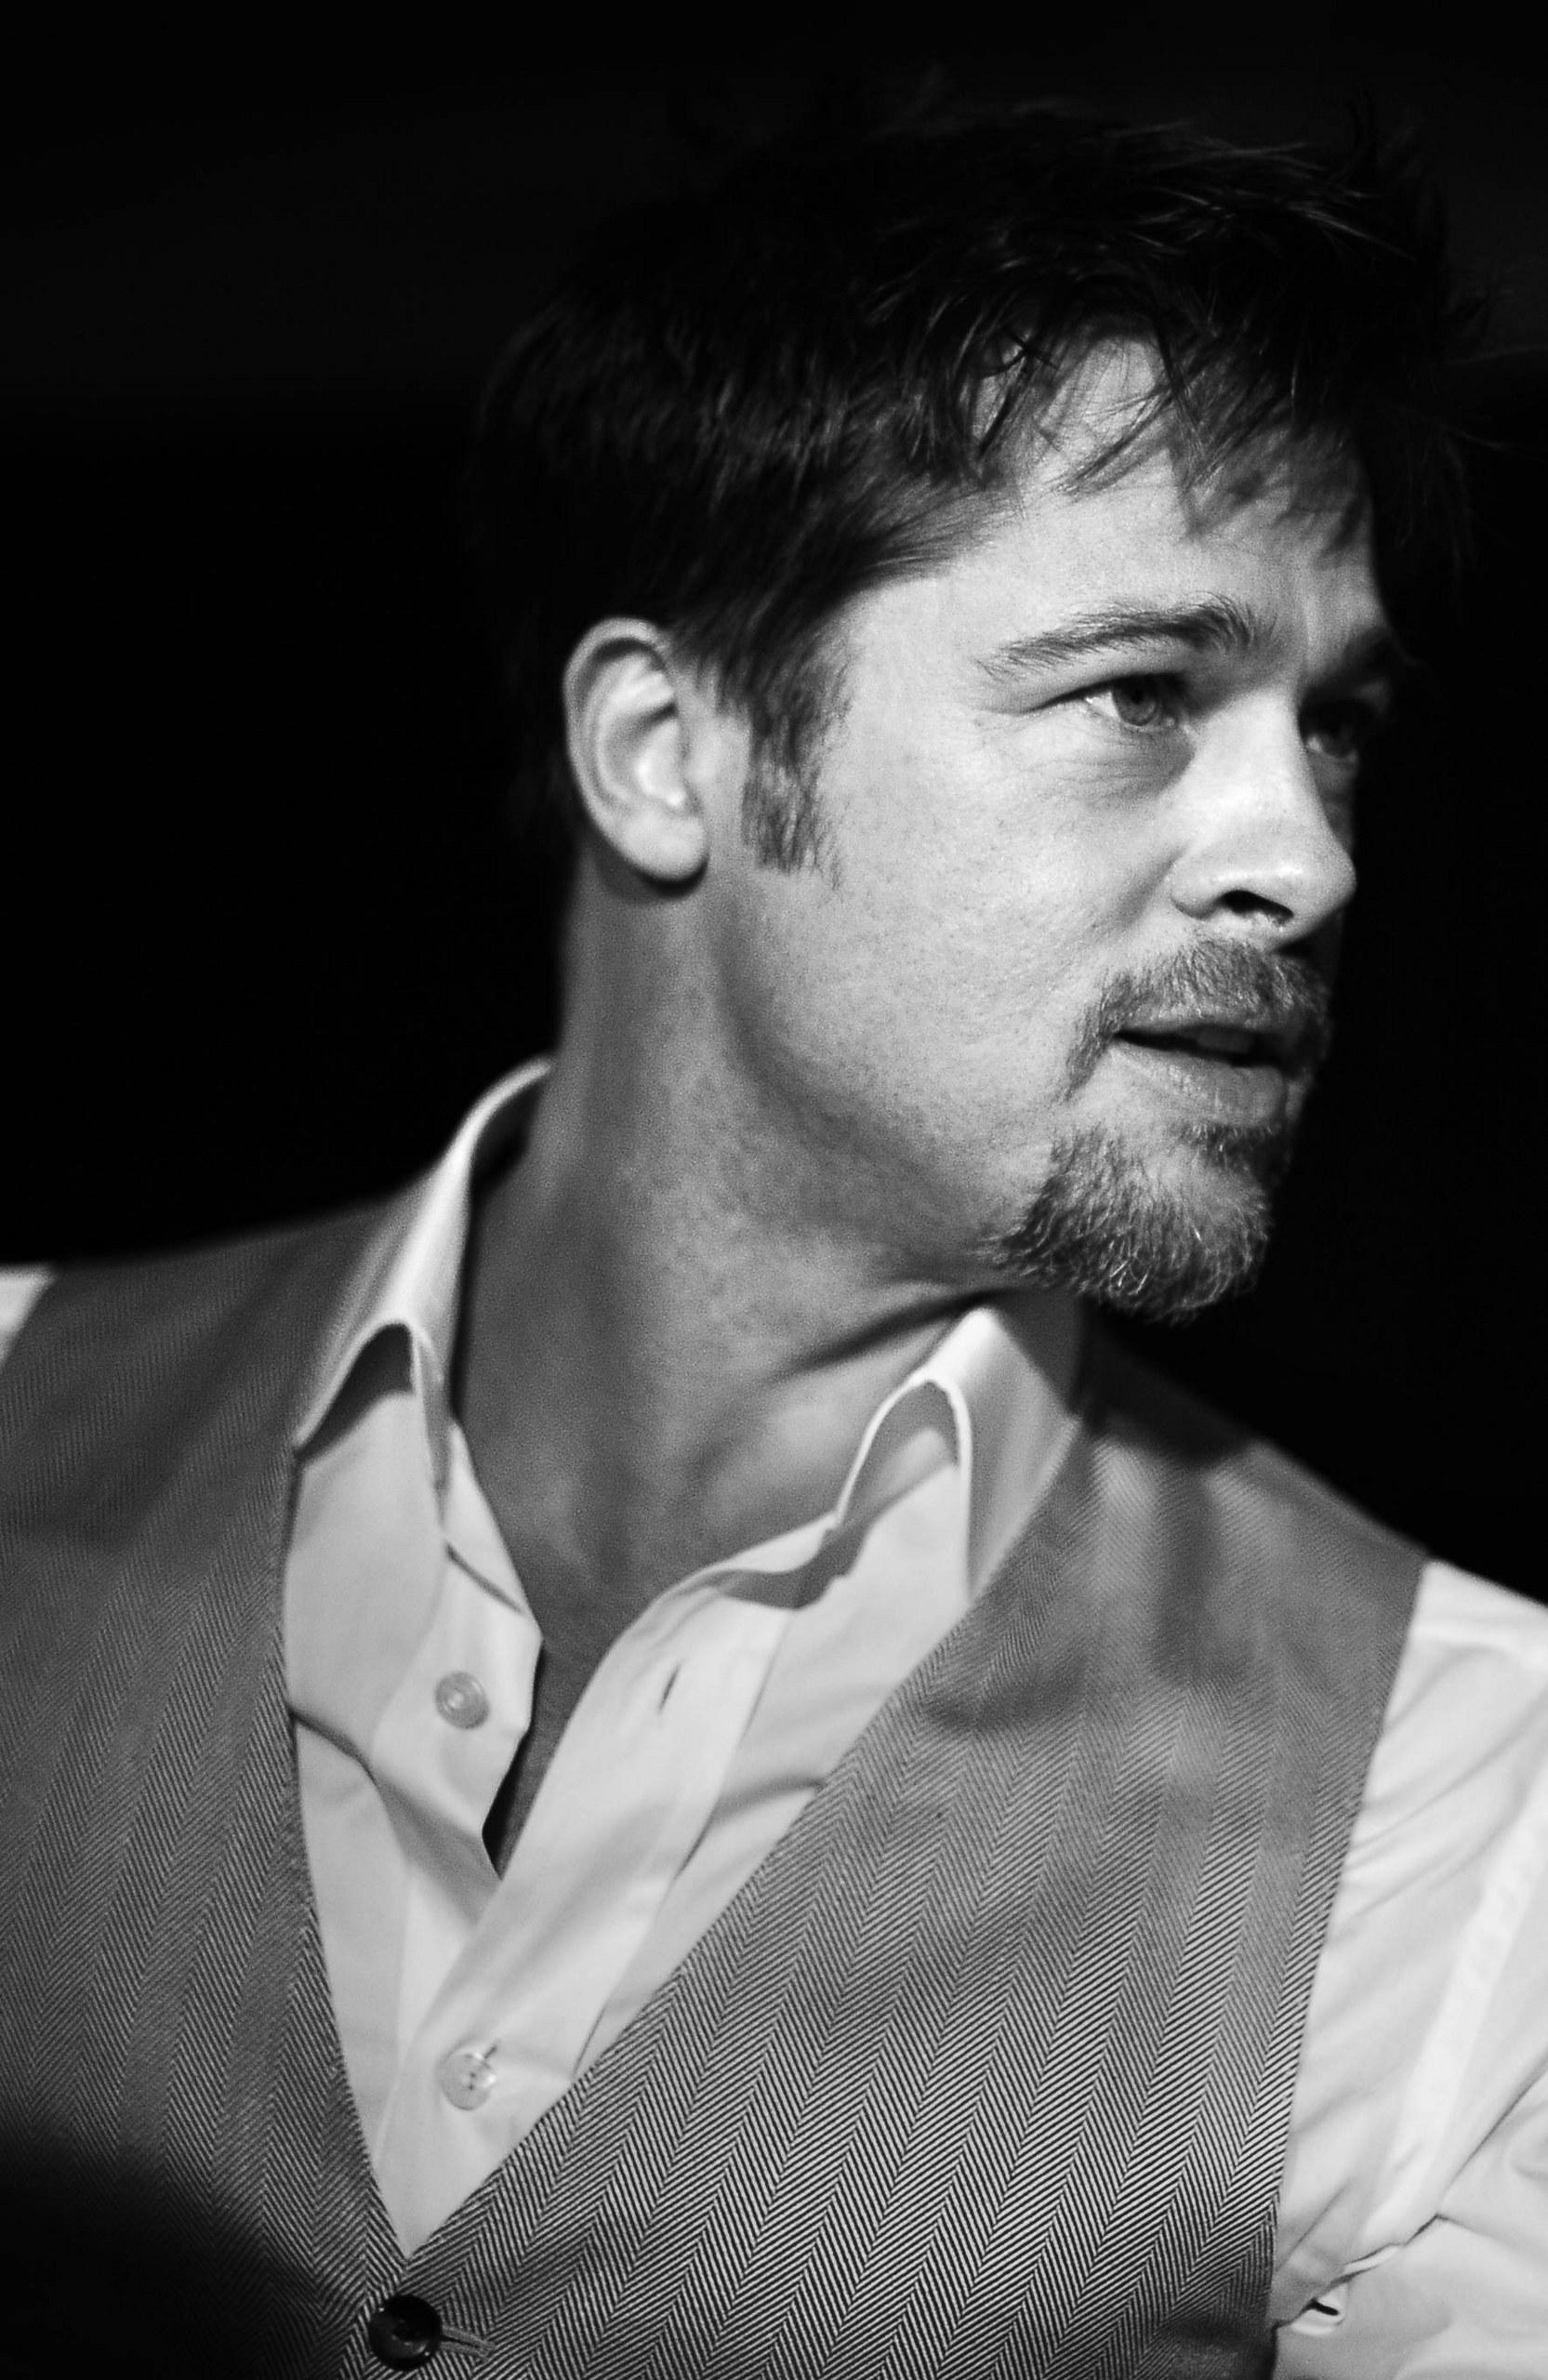 Brad Pitt - Brad Pitt Photo (3308481) - Fanpop Brad Pitt News